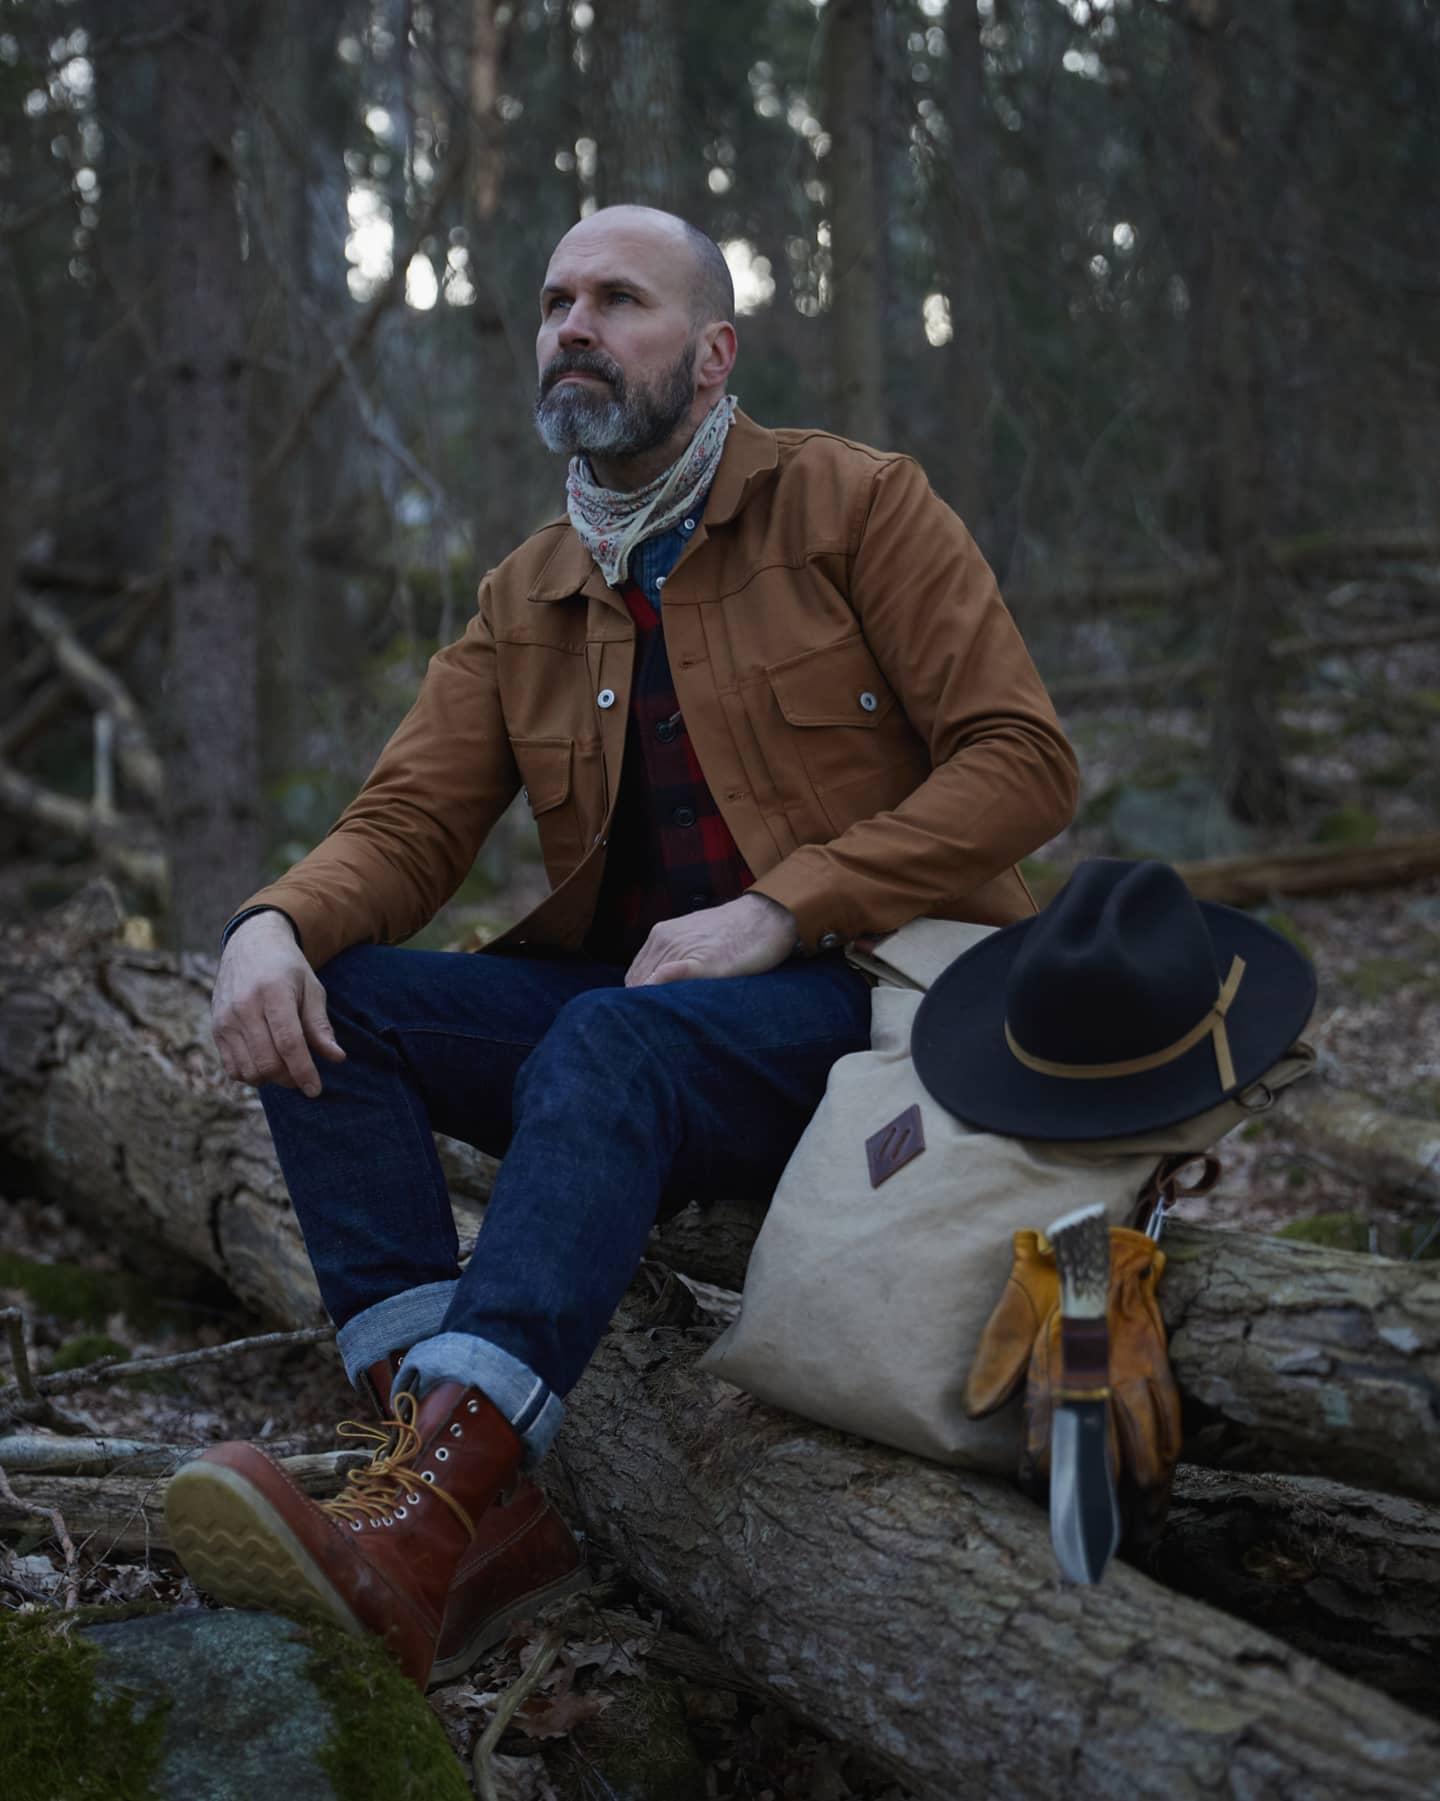 Lumberjack Rugged Style Ideas for Men -thomas.wijk_